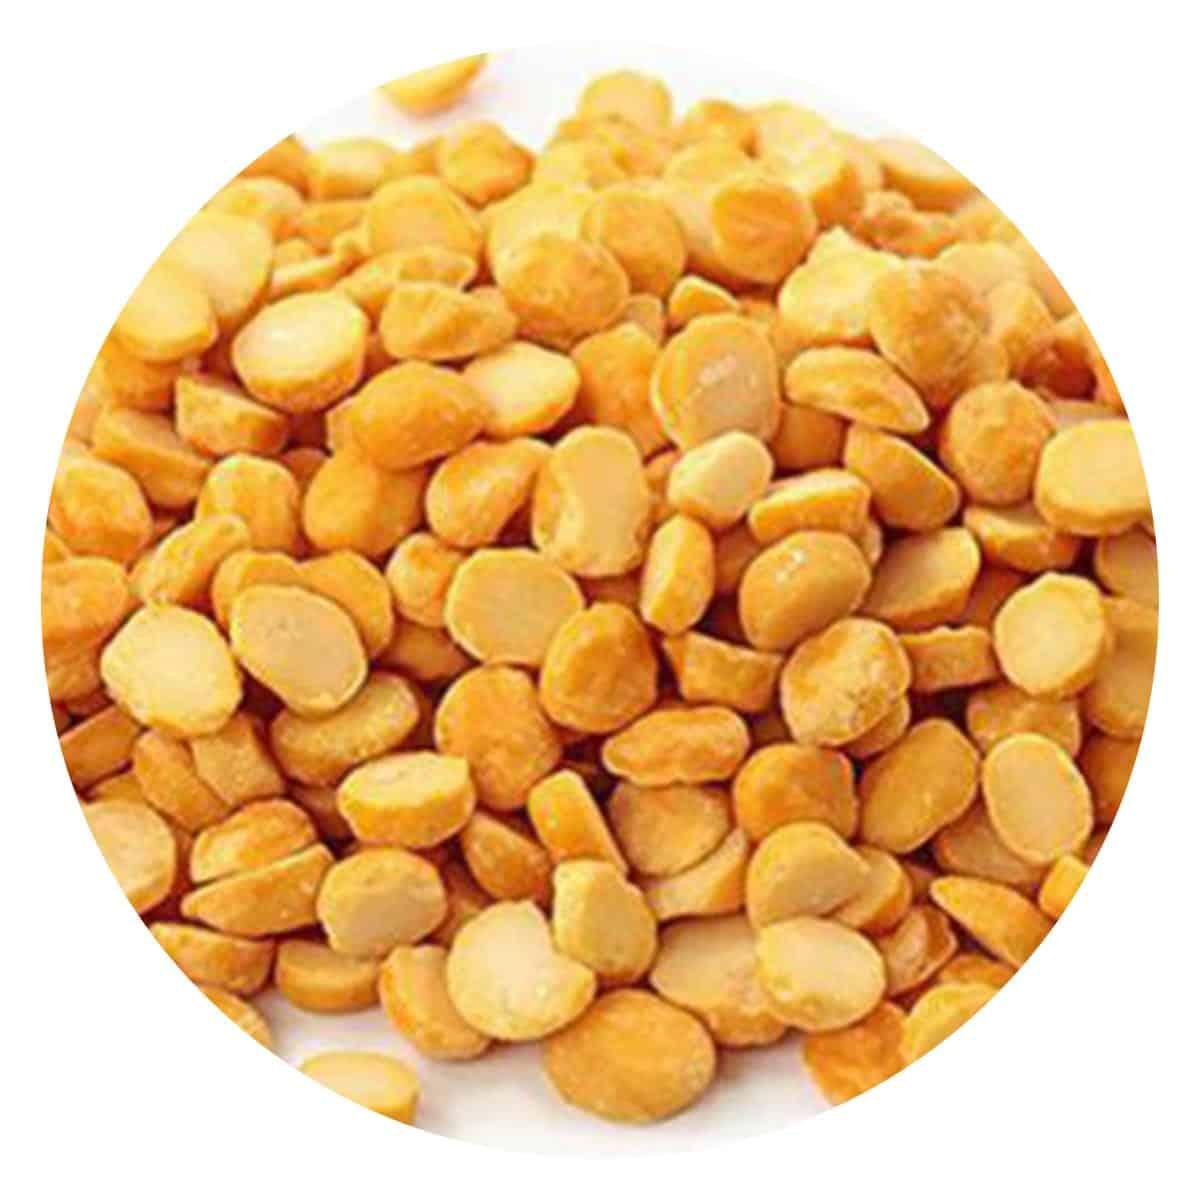 Buy IAG Foods Channa Dal (Split Black Chickpeas) - 1 kg